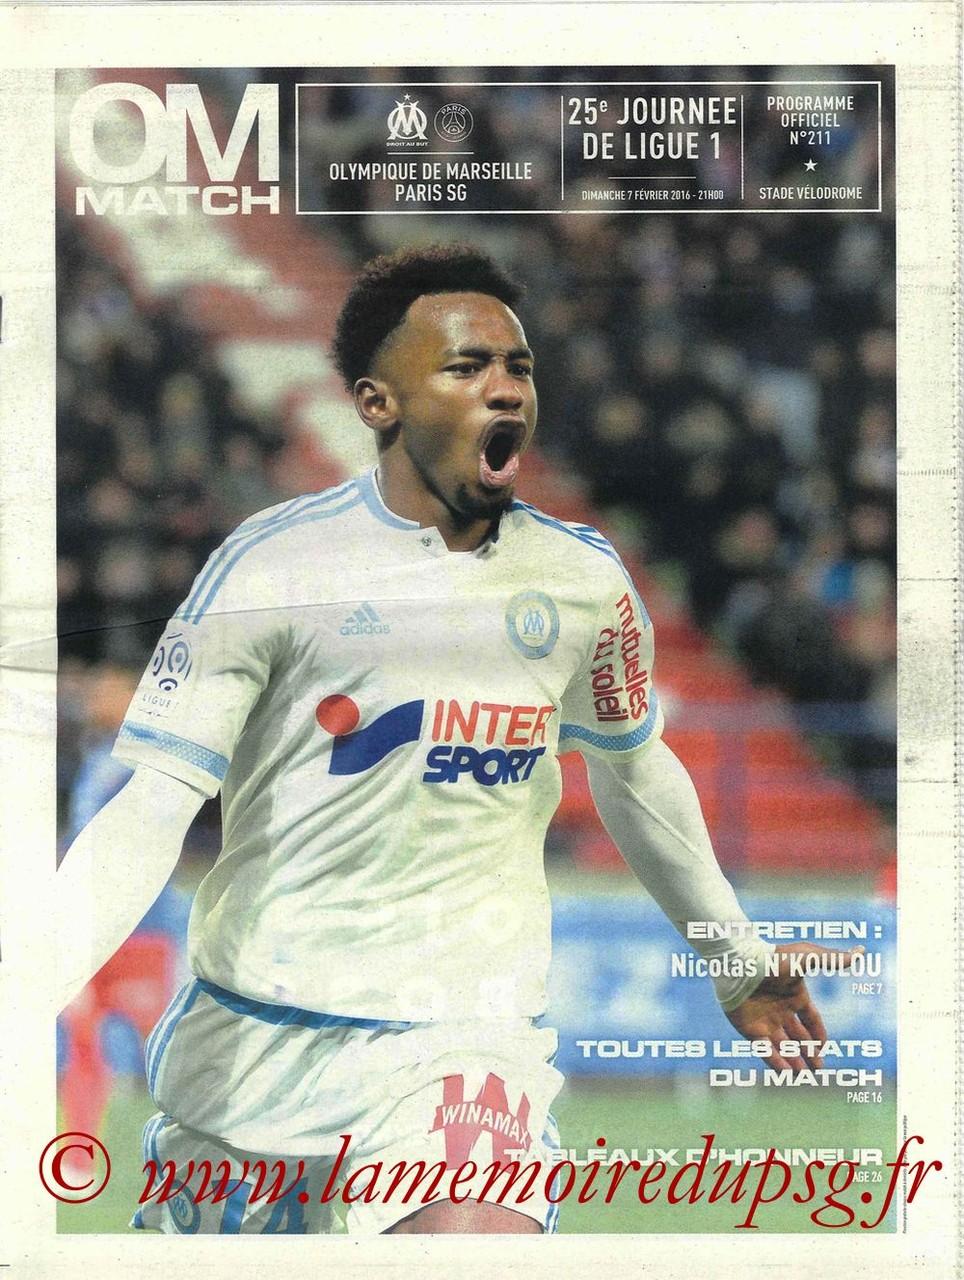 2016-02-07  Marseille-PSG (25ème L1, OM Match N°211)